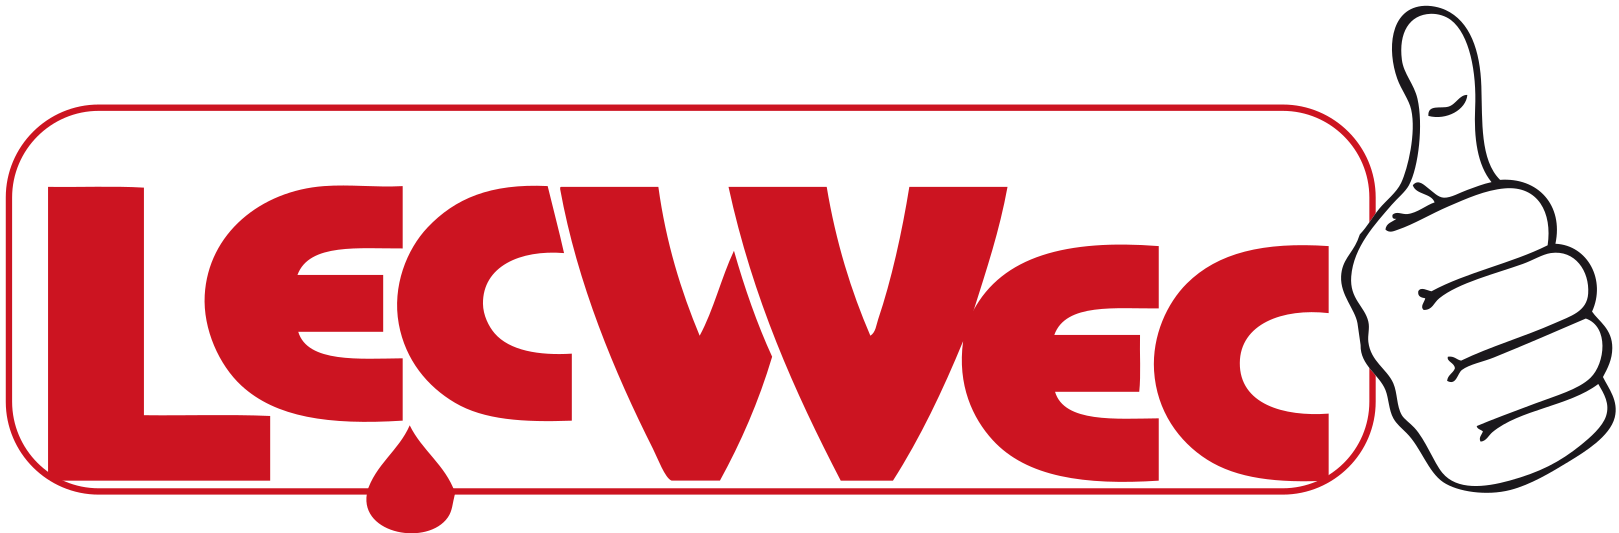 LecWec